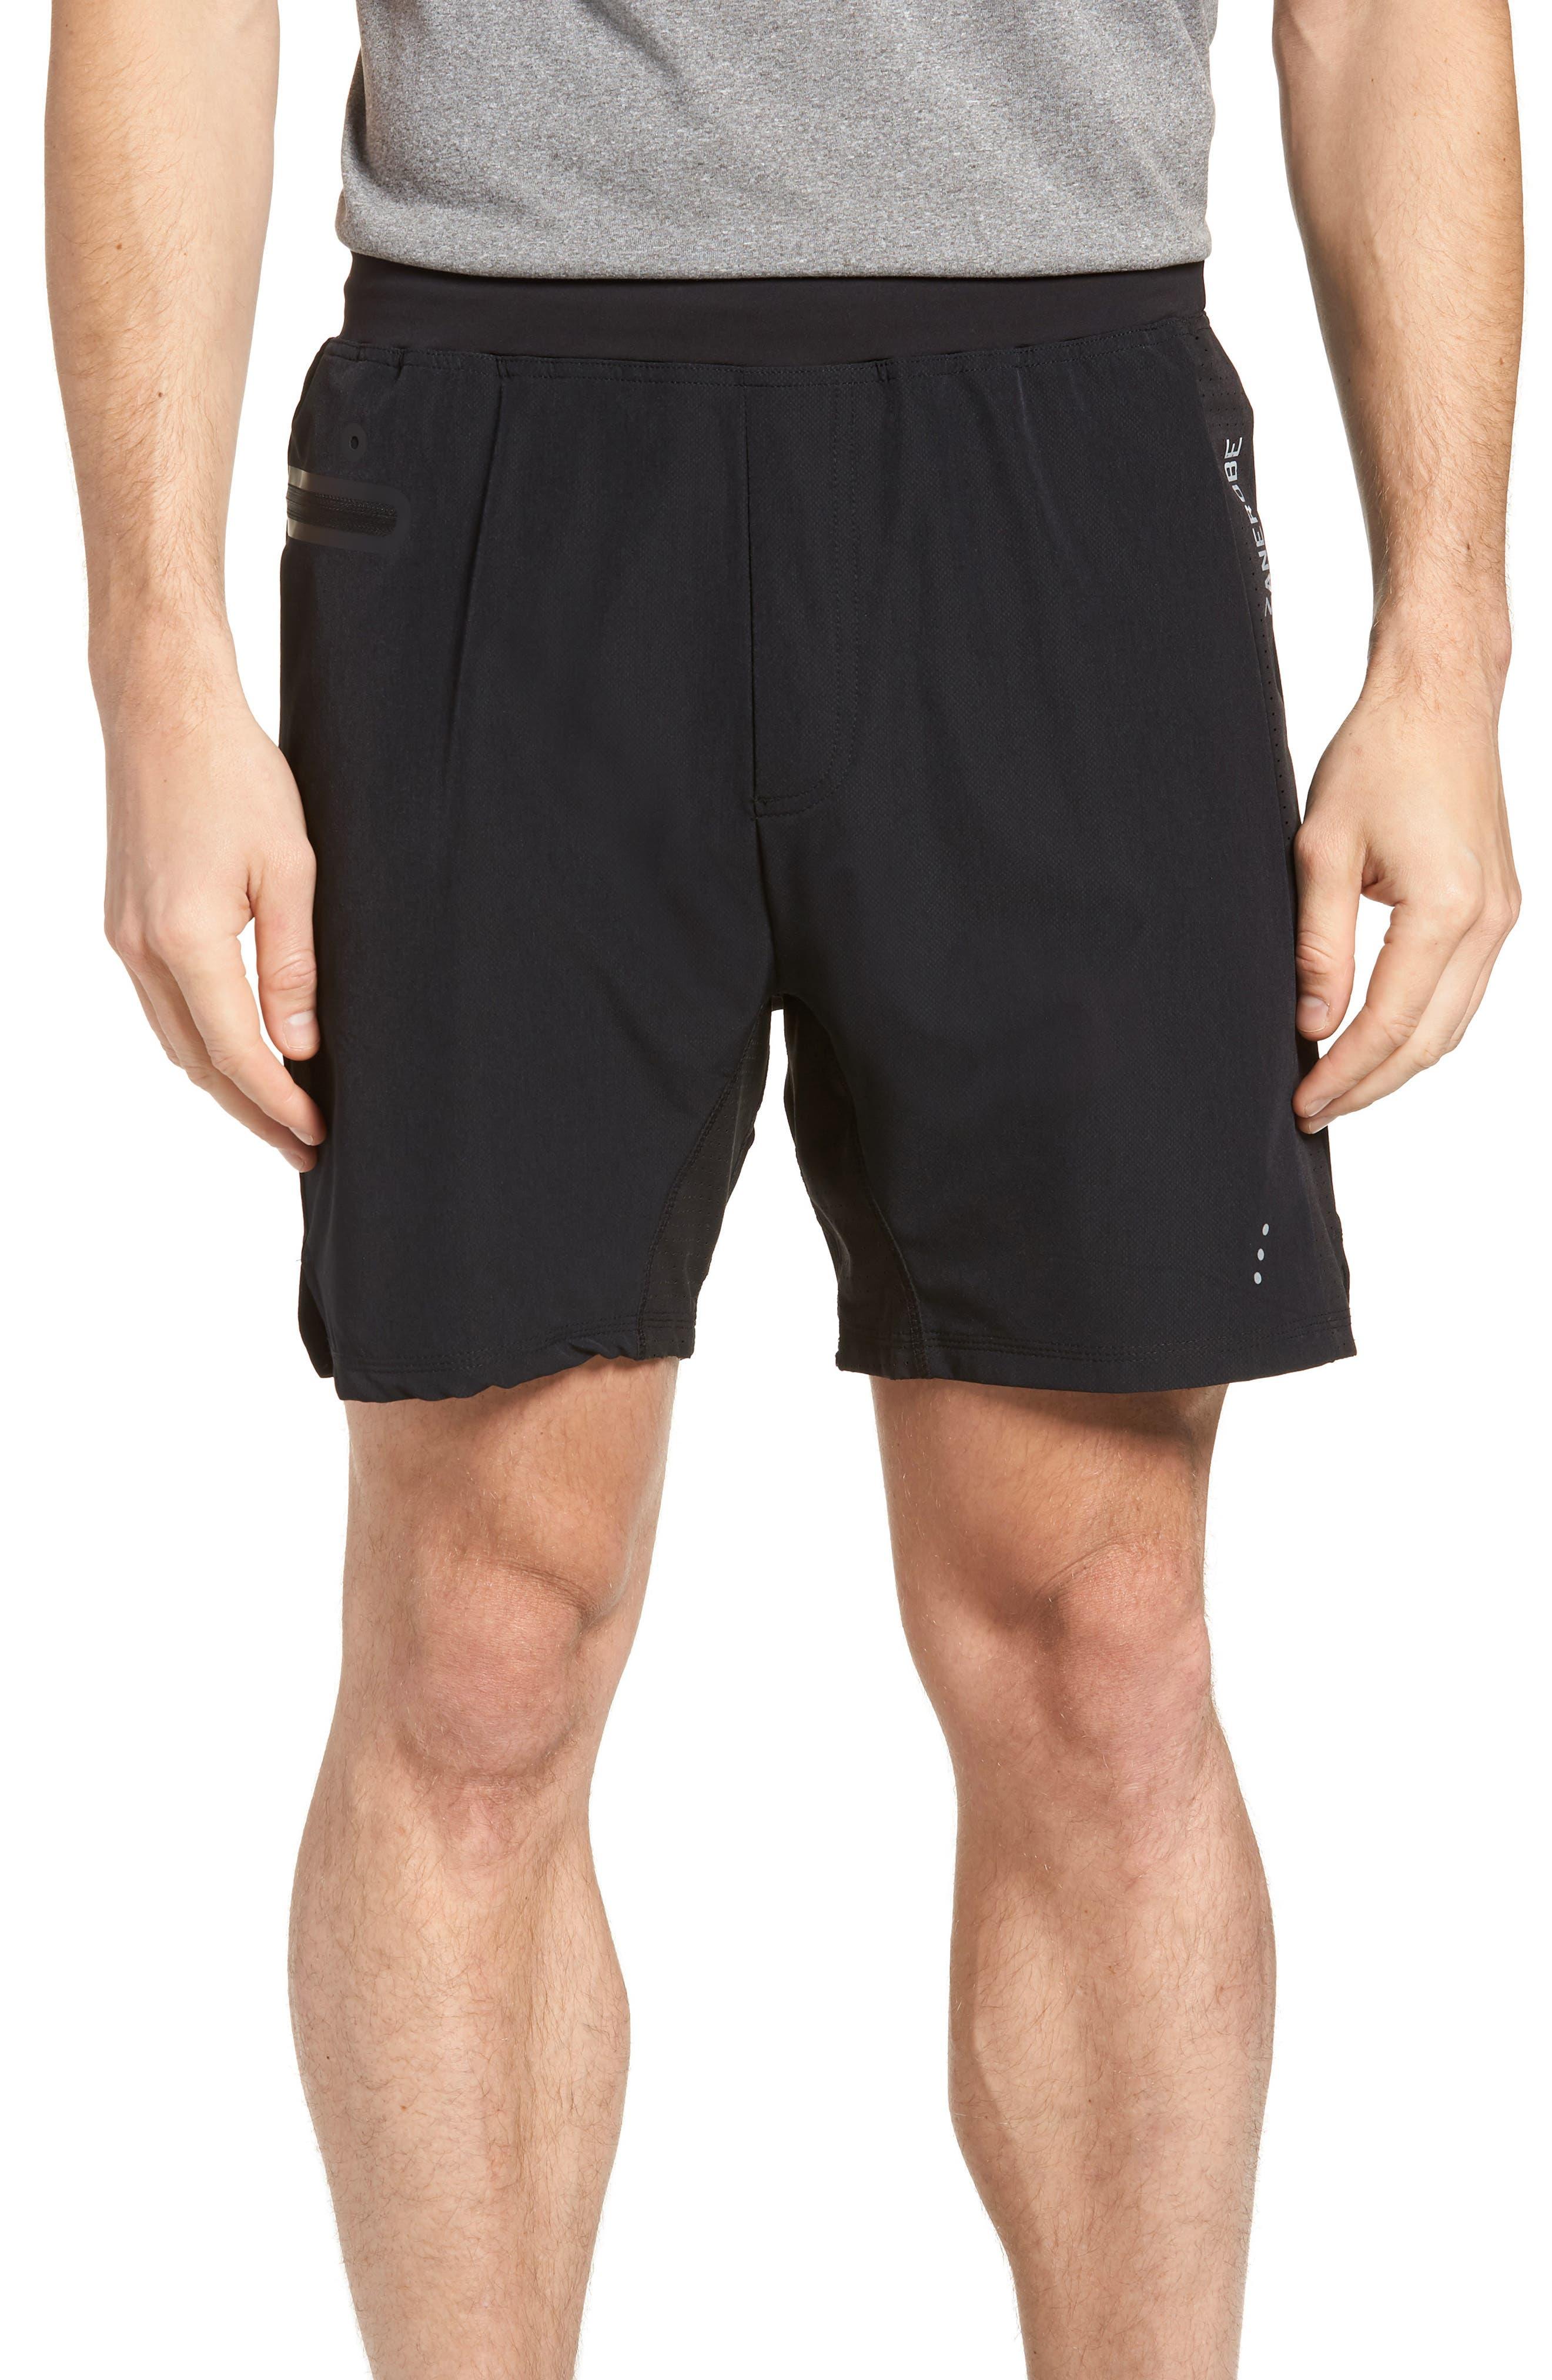 ZANEROBE Type 1 Shorts,                             Main thumbnail 1, color,                             001